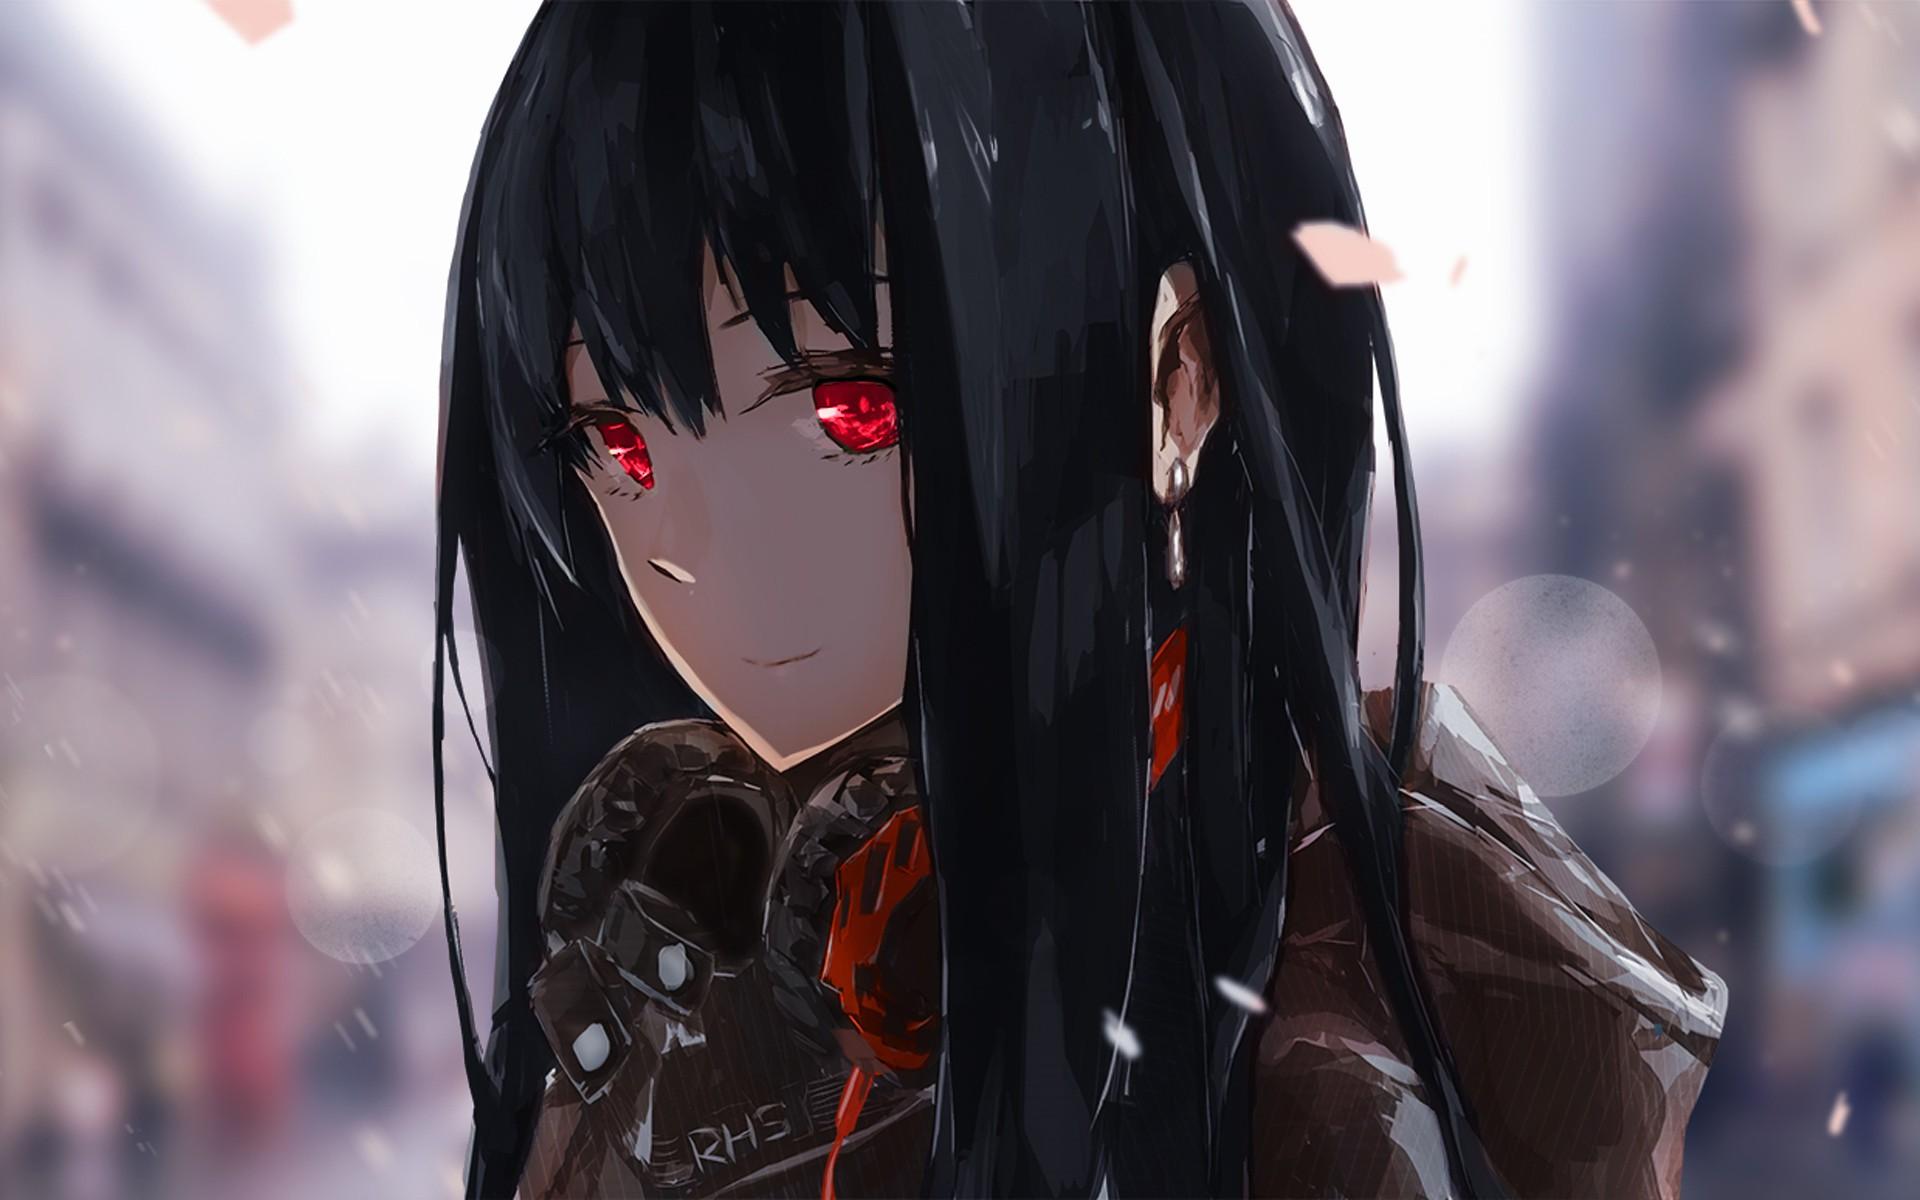 Anime 1920x1200 anime headphones red eyes black hair THE iDOLM@STER: Cinderella Girls Shibuya Rin THE iDOLM@STER Lowlight Kirilenko anime girls rain dark hair looking at viewer